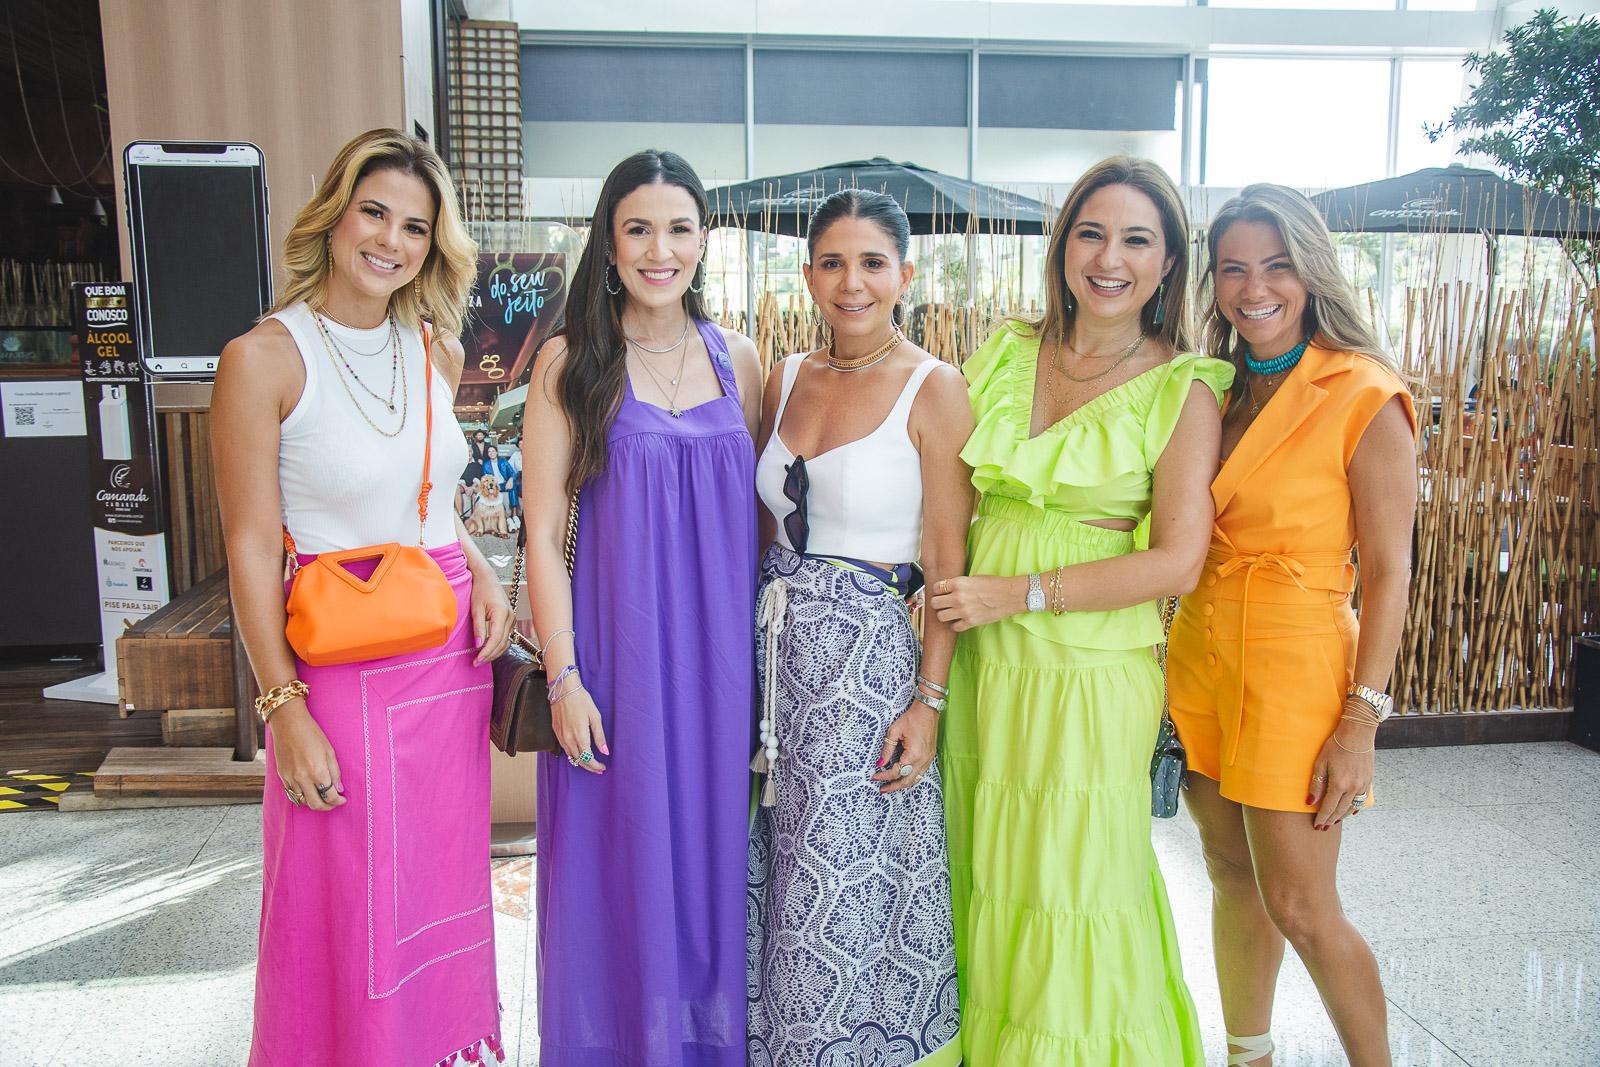 Juliana Roma, Giuliana Botelho, Maria Lucia Negrao, Marcella Feitosa E Vanessa Queiros